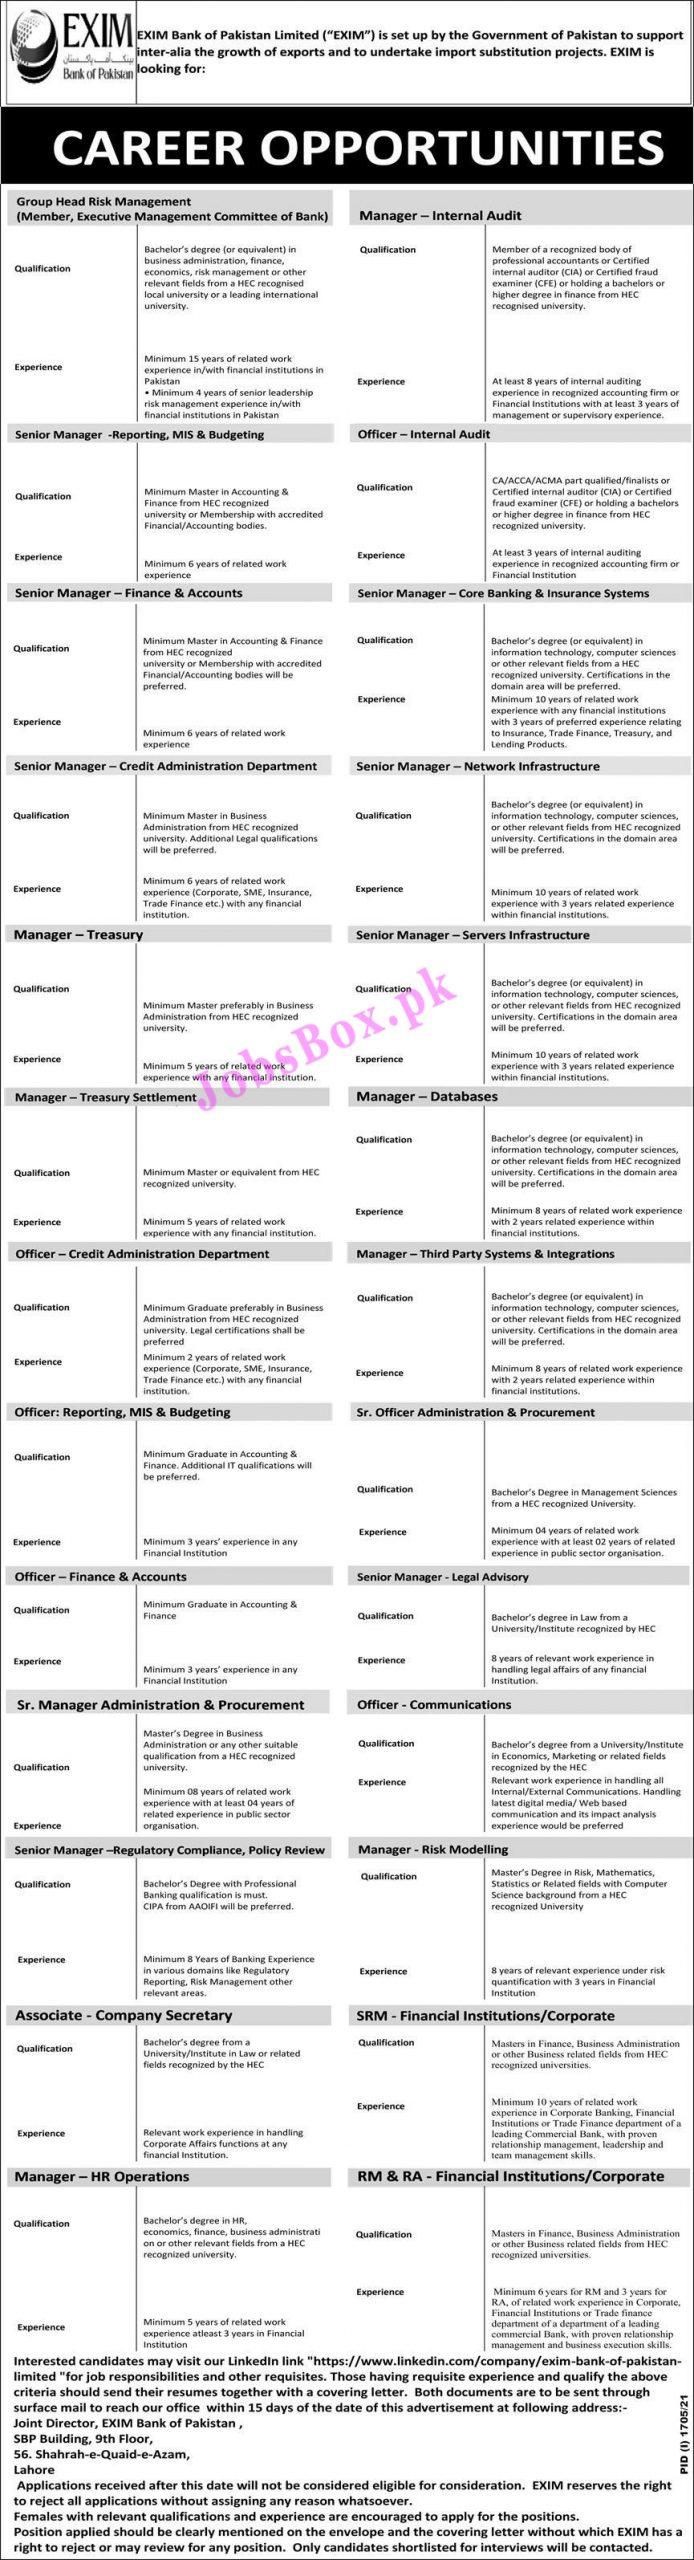 https://www.linkedin.com/company/exim-bank-of-pakistan-limited - EXIM Bank of Pakistan Jobs 2021 in Pakistan